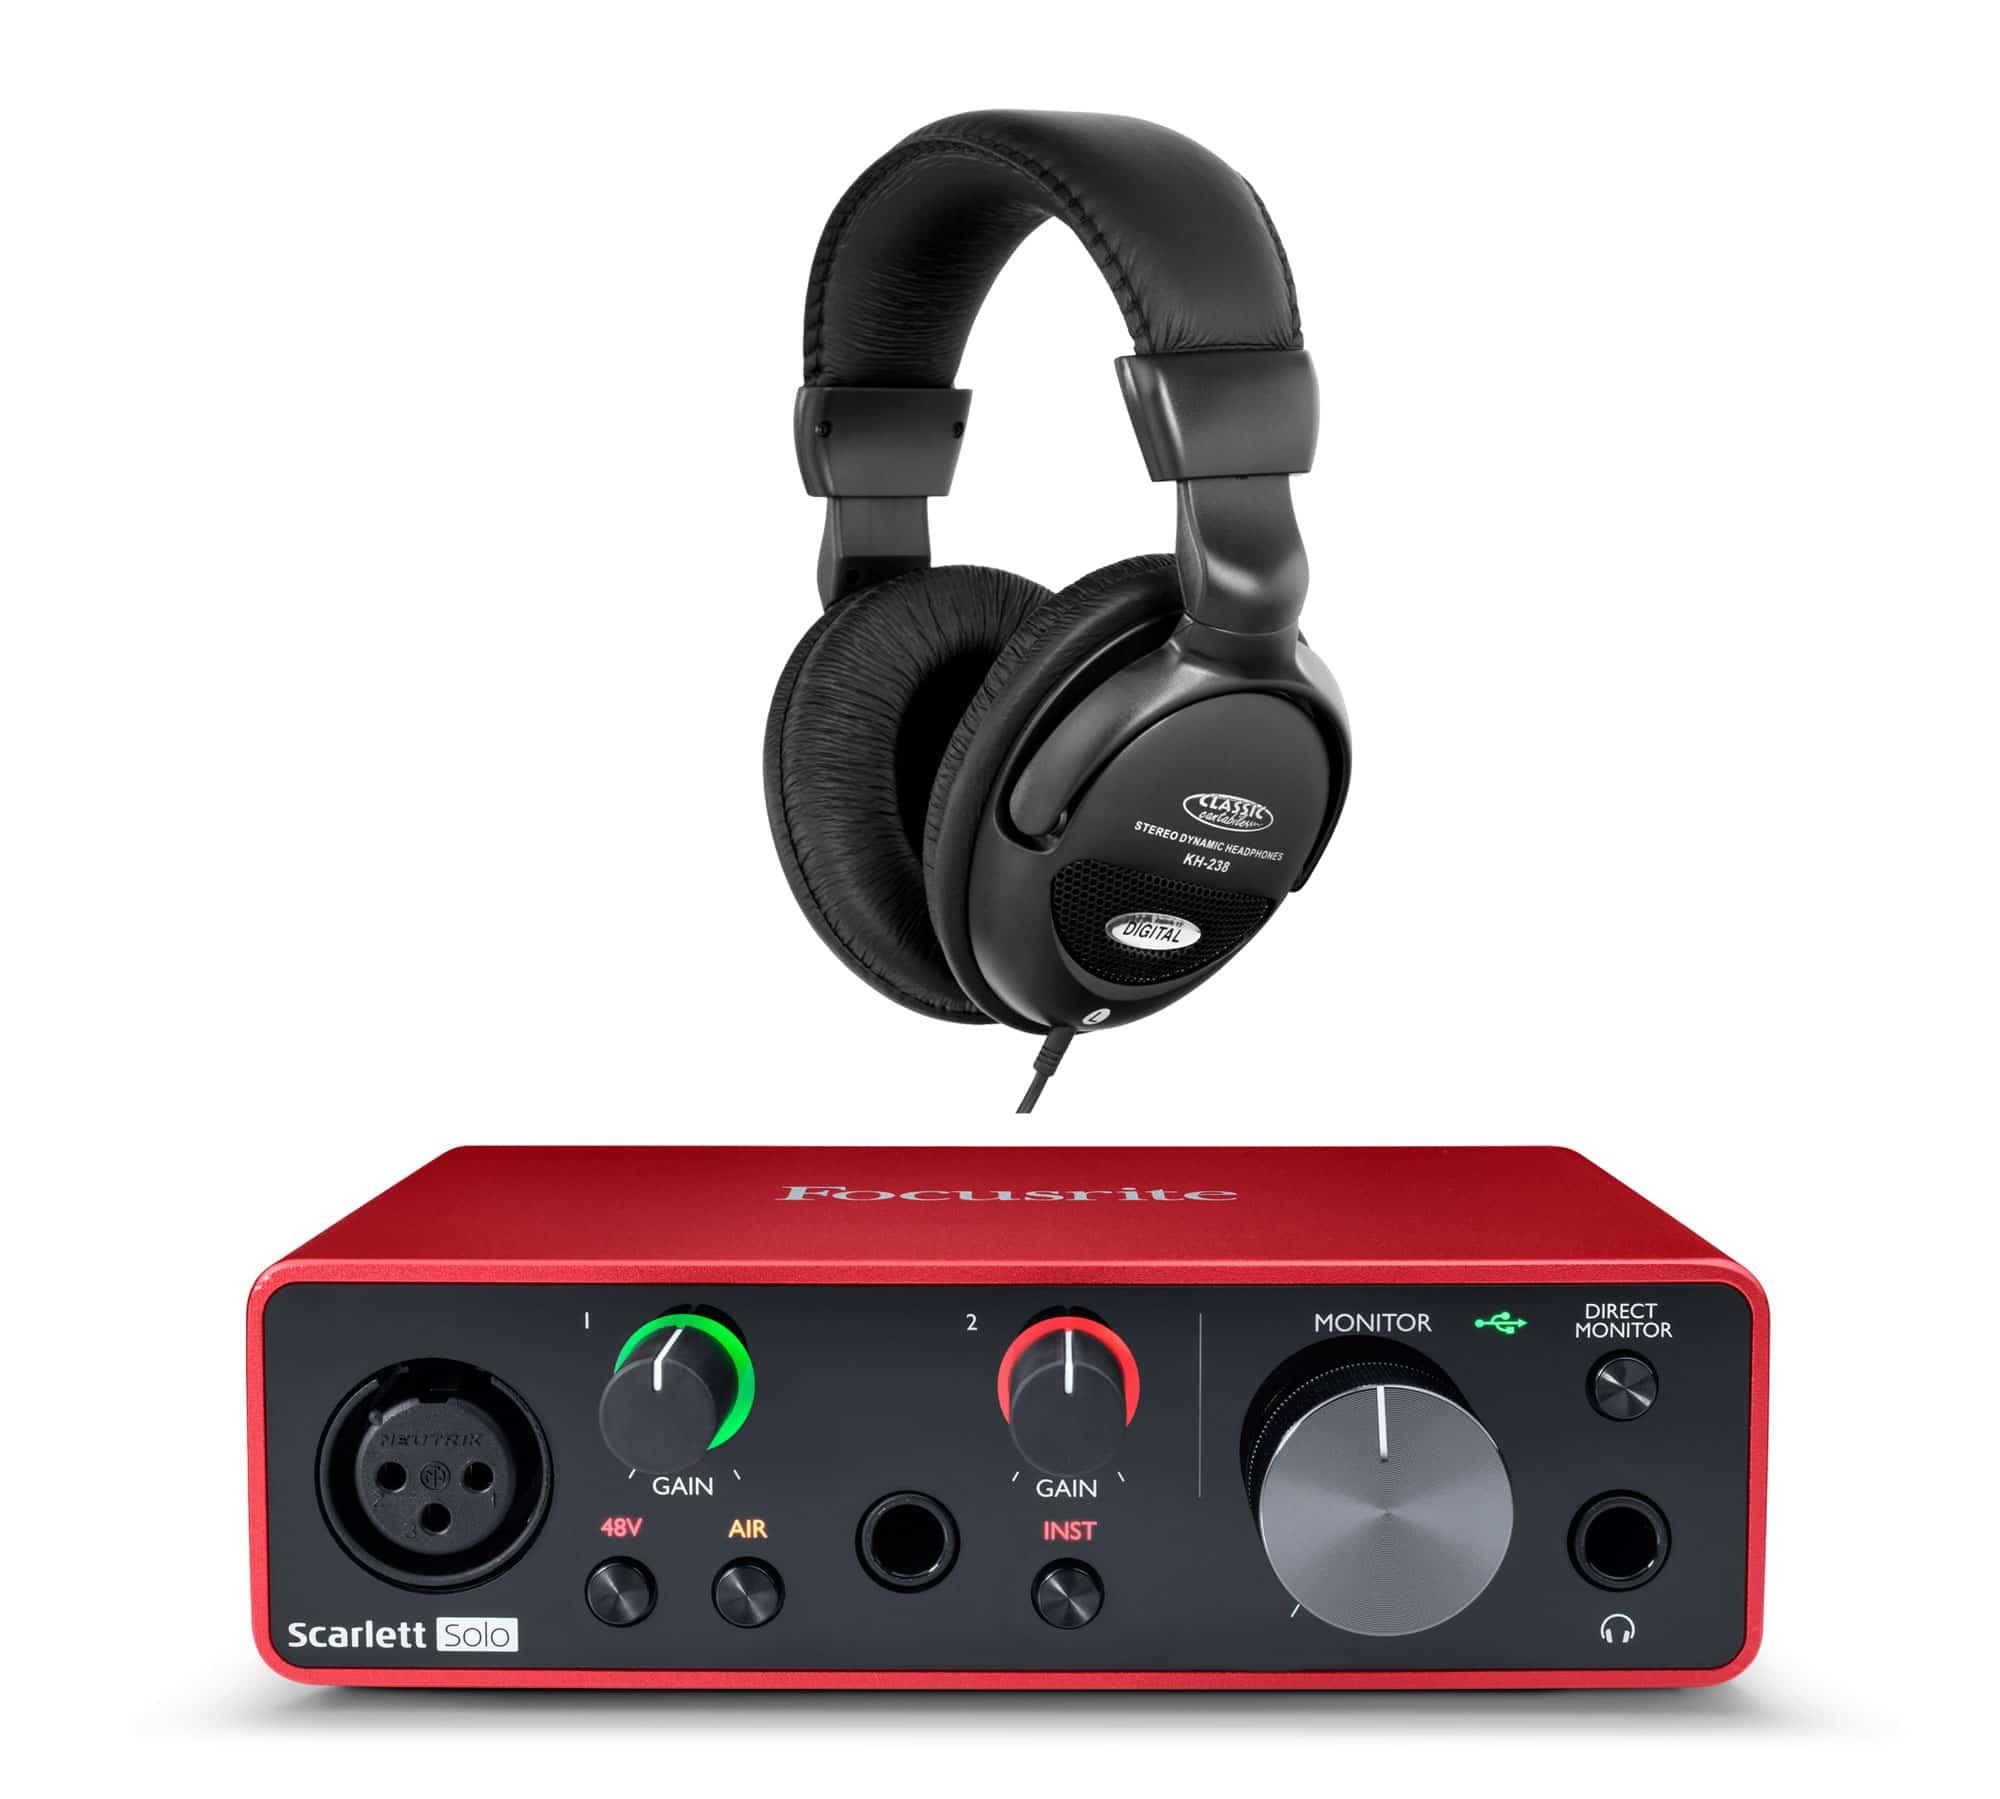 Focusrite Scarlett Solo USB Audio Interface Set